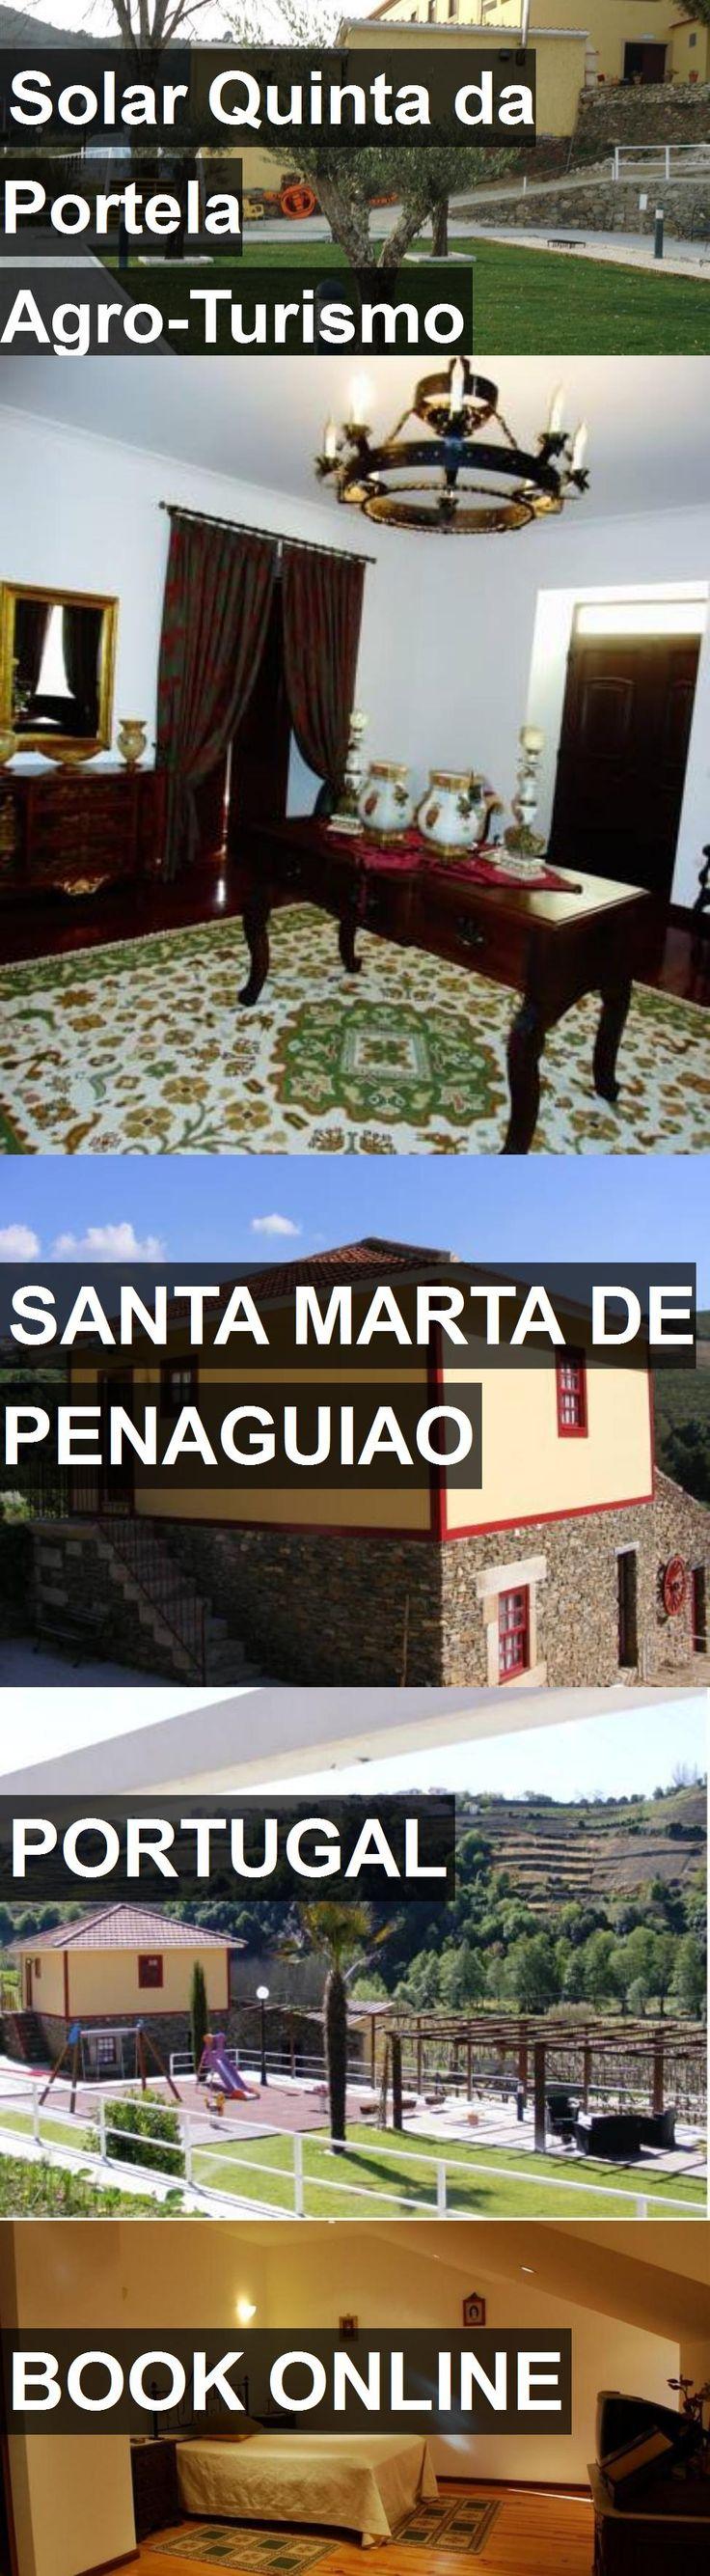 Hotel Solar Quinta da Portela Agro-Turismo in Santa Marta de Penaguiao, Portugal. For more information, photos, reviews and best prices please follow the link. #Portugal #SantaMartadePenaguiao #travel #vacation #hotel